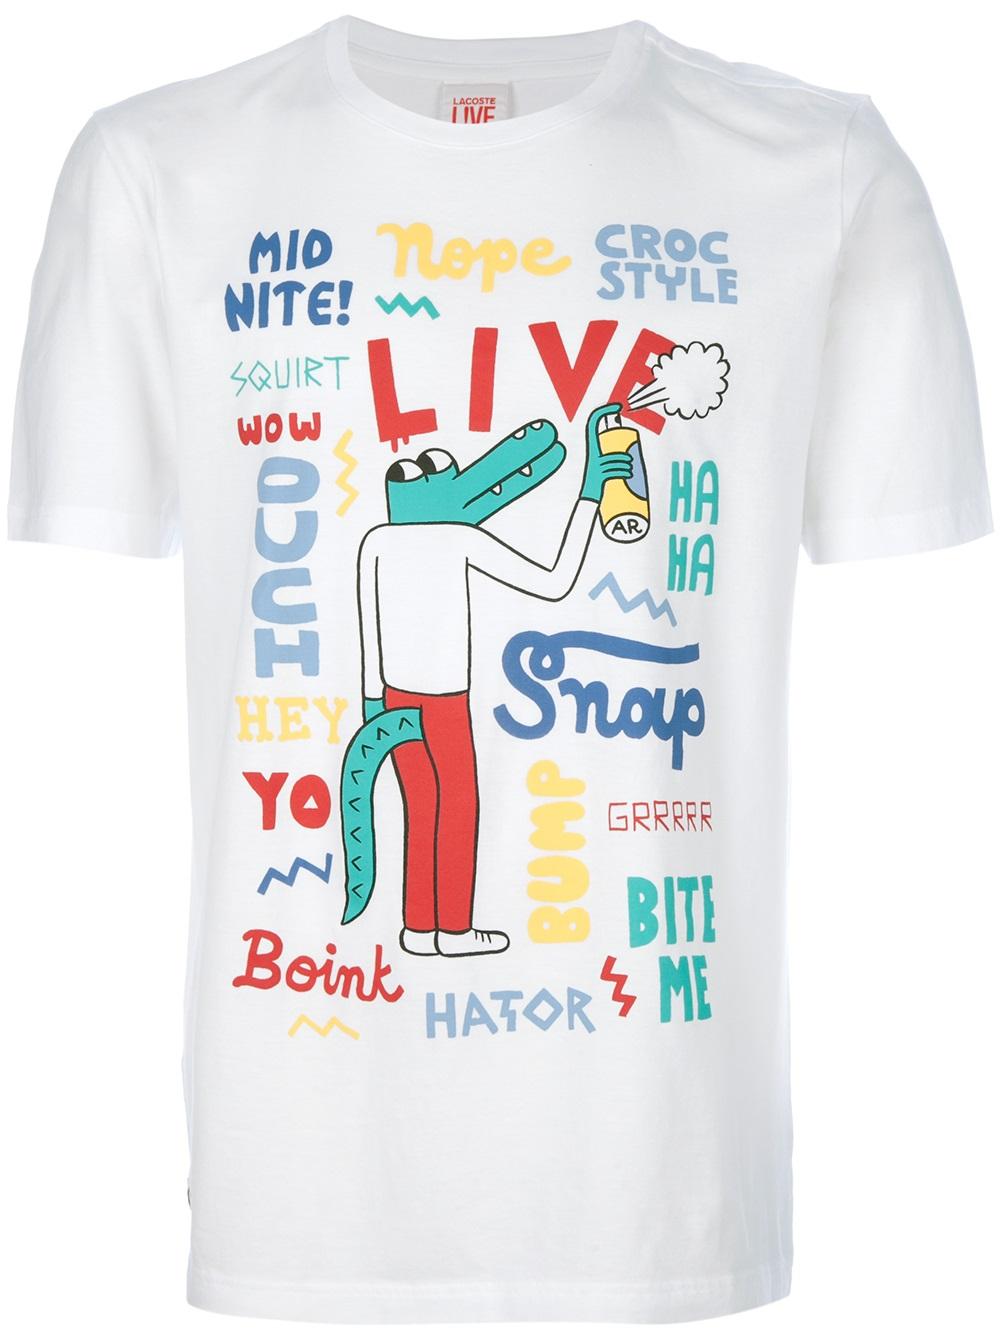 aa9b221d Lacoste L!ive Crocodile Graffiti Print Tshirt in White for Men - Lyst